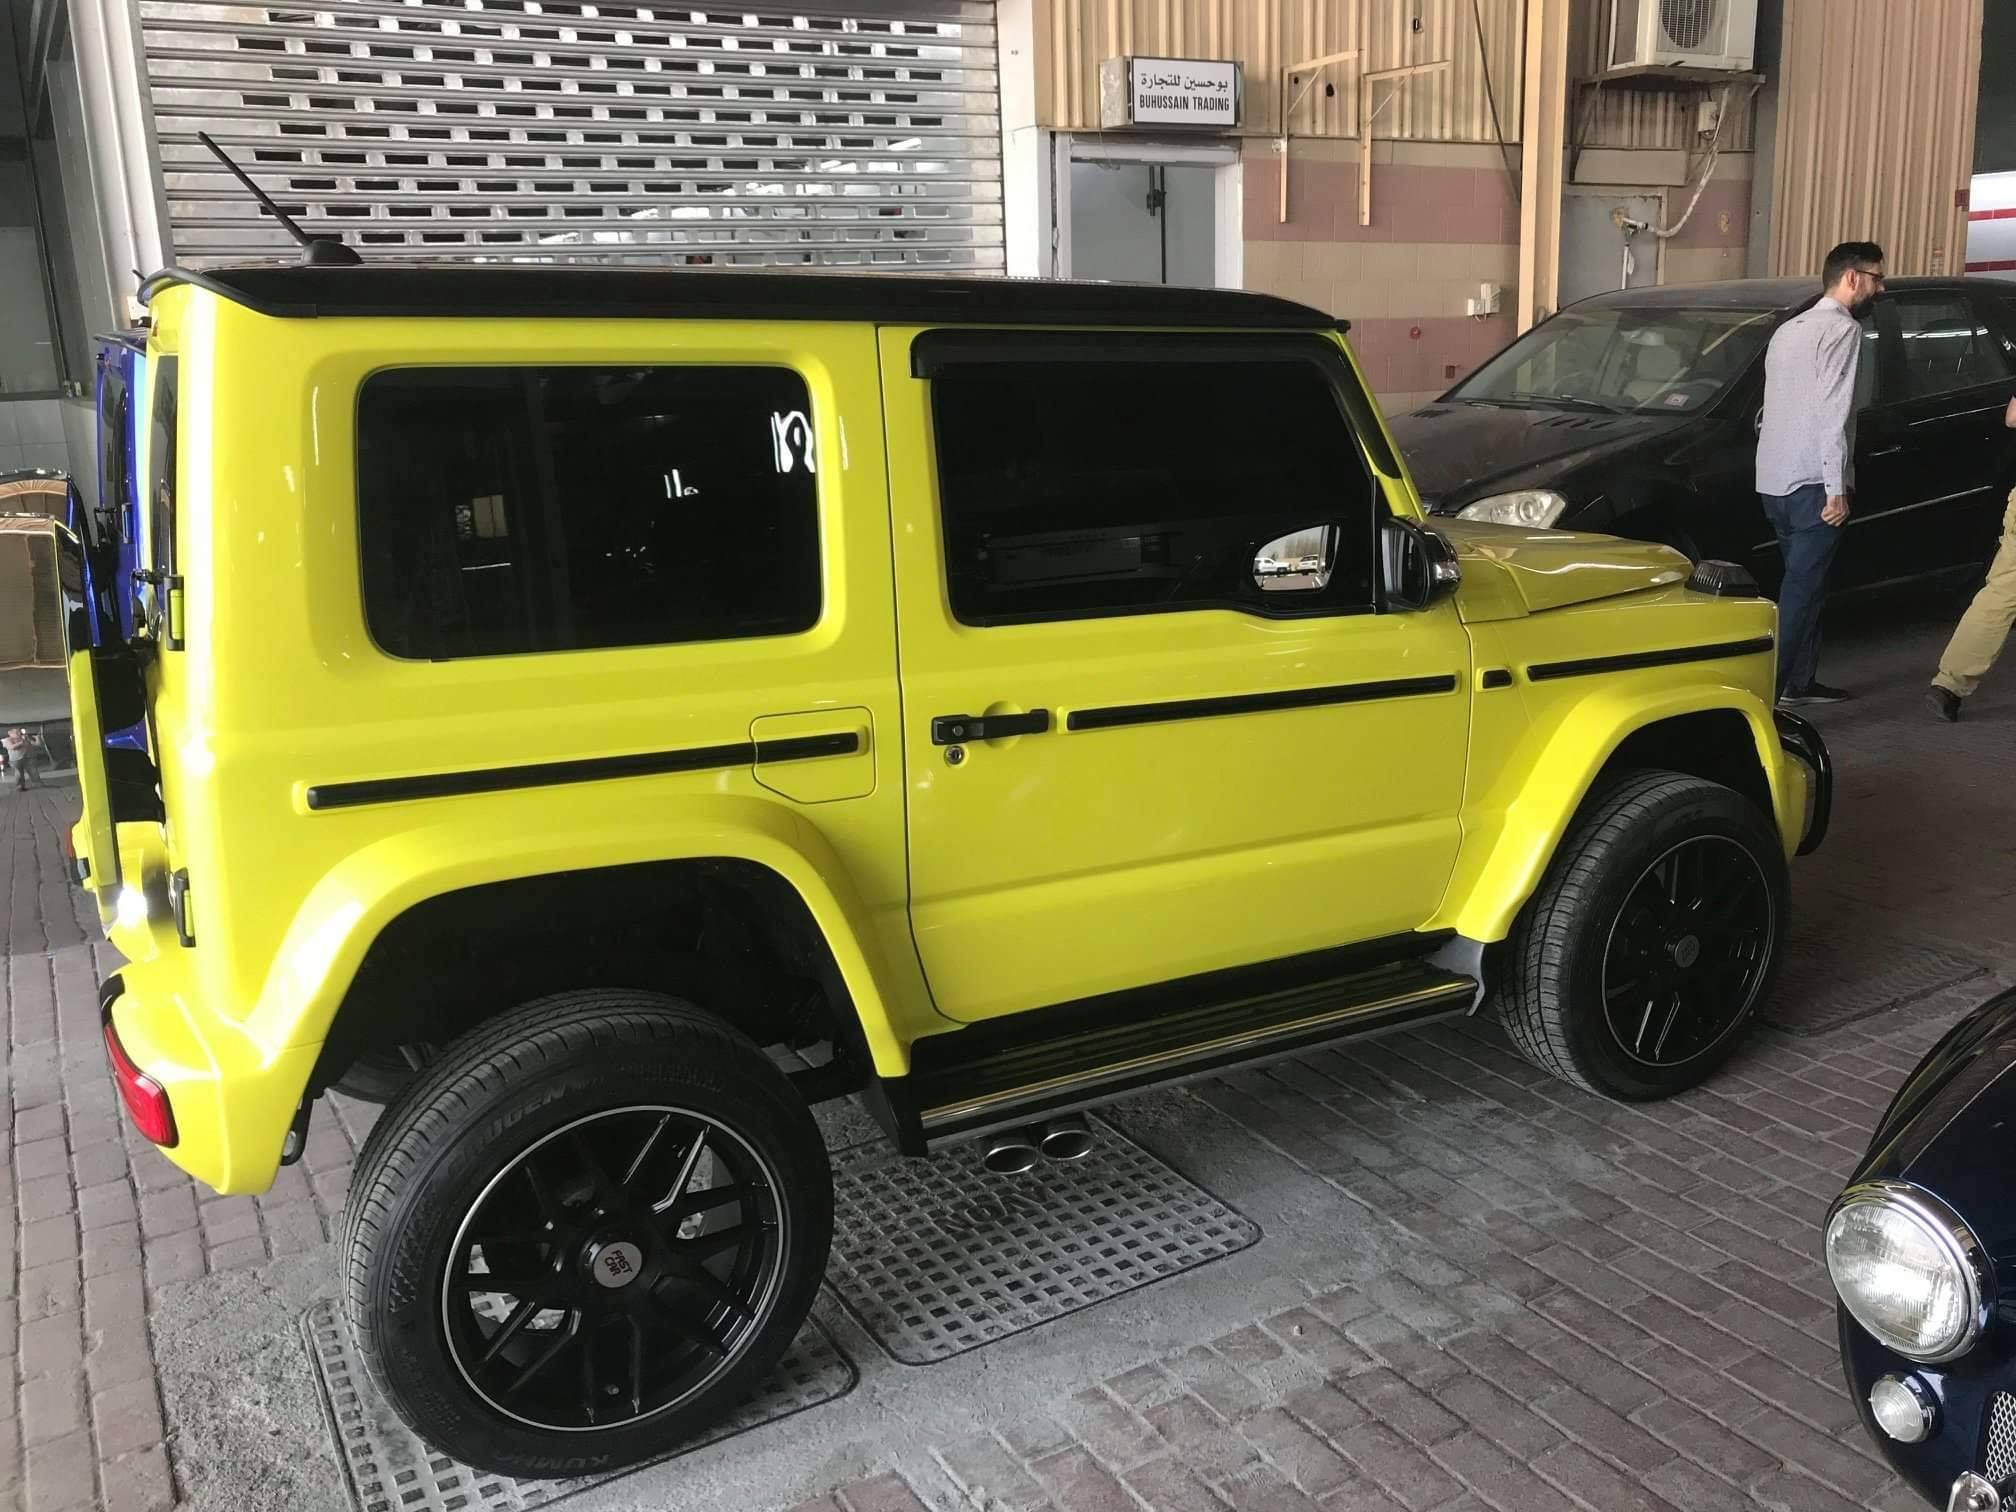 Suzuki-Jimny-bodykit-g-class-like-1